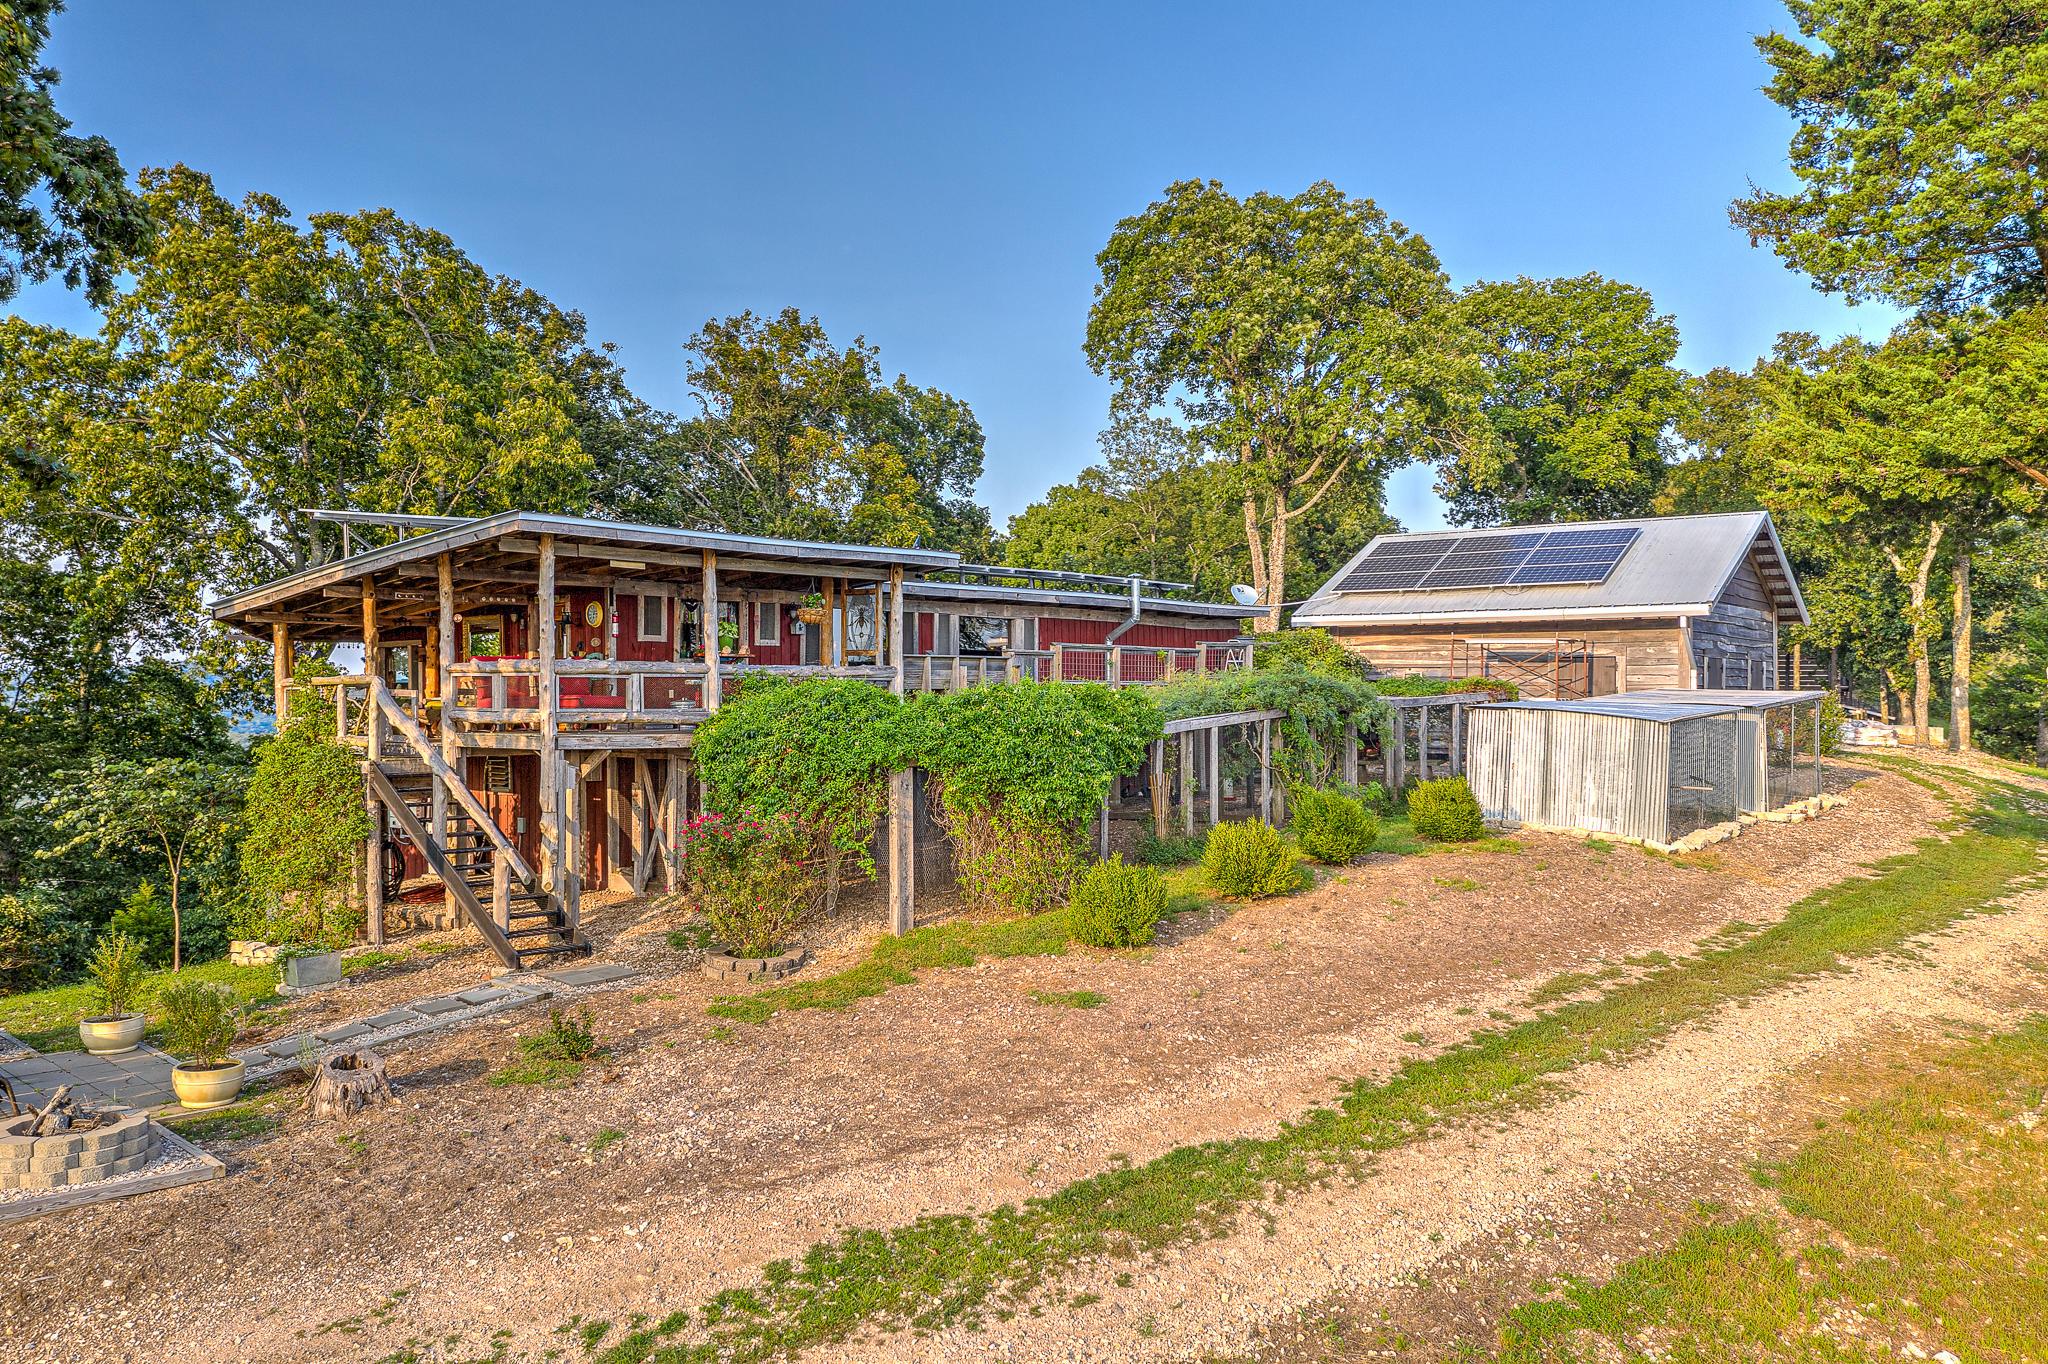 1150 County Rd Eureka Springs, AR 72631